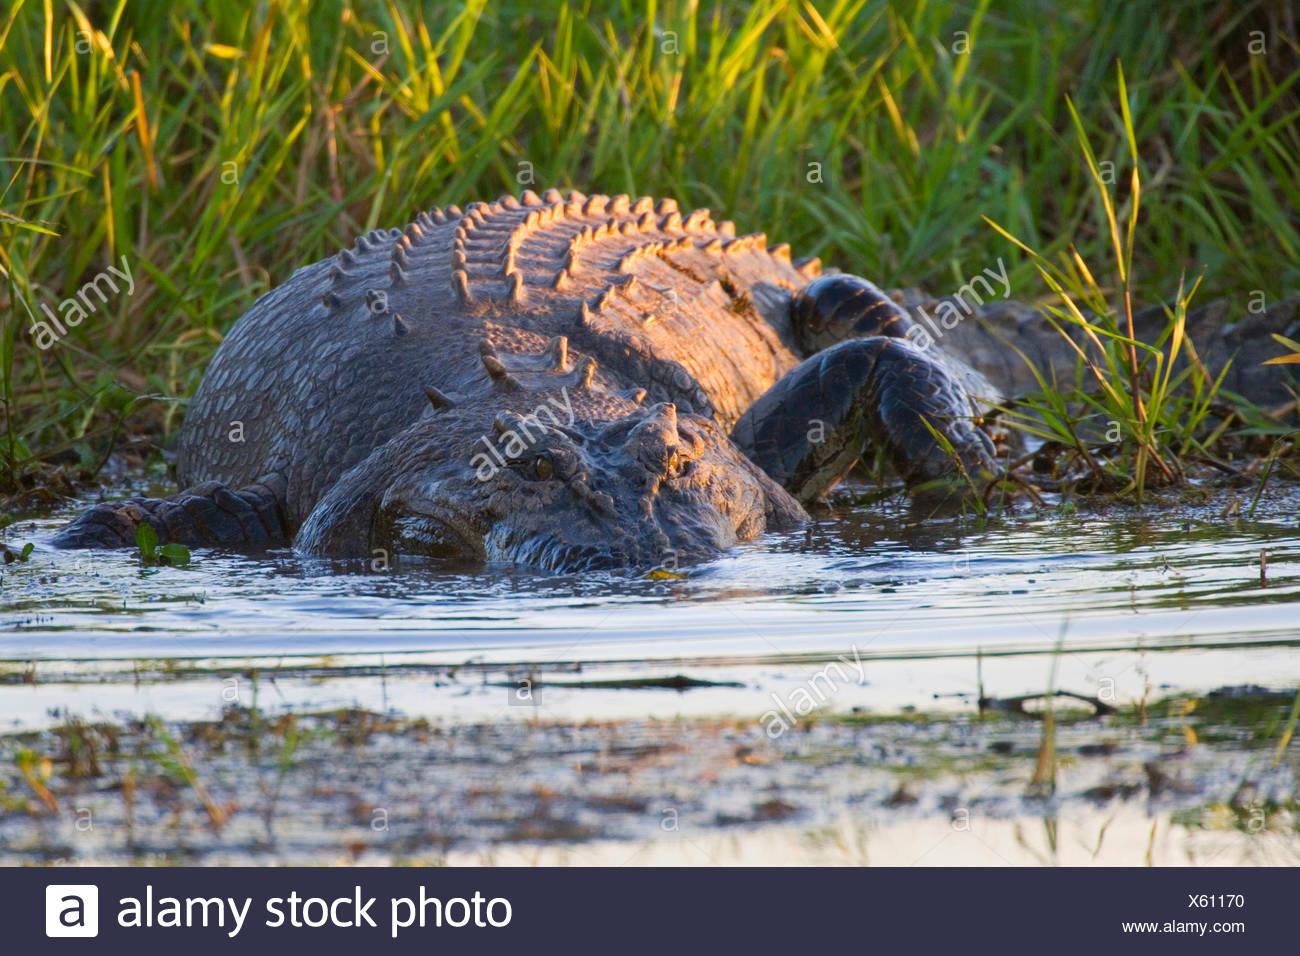 saltwater crocodile, estuarine crocodile (Crocodylus porosus), big Saltwater Crocodile lying in wait for prey in a billabong in a swamp, Australia, Northern Territory Stock Photo